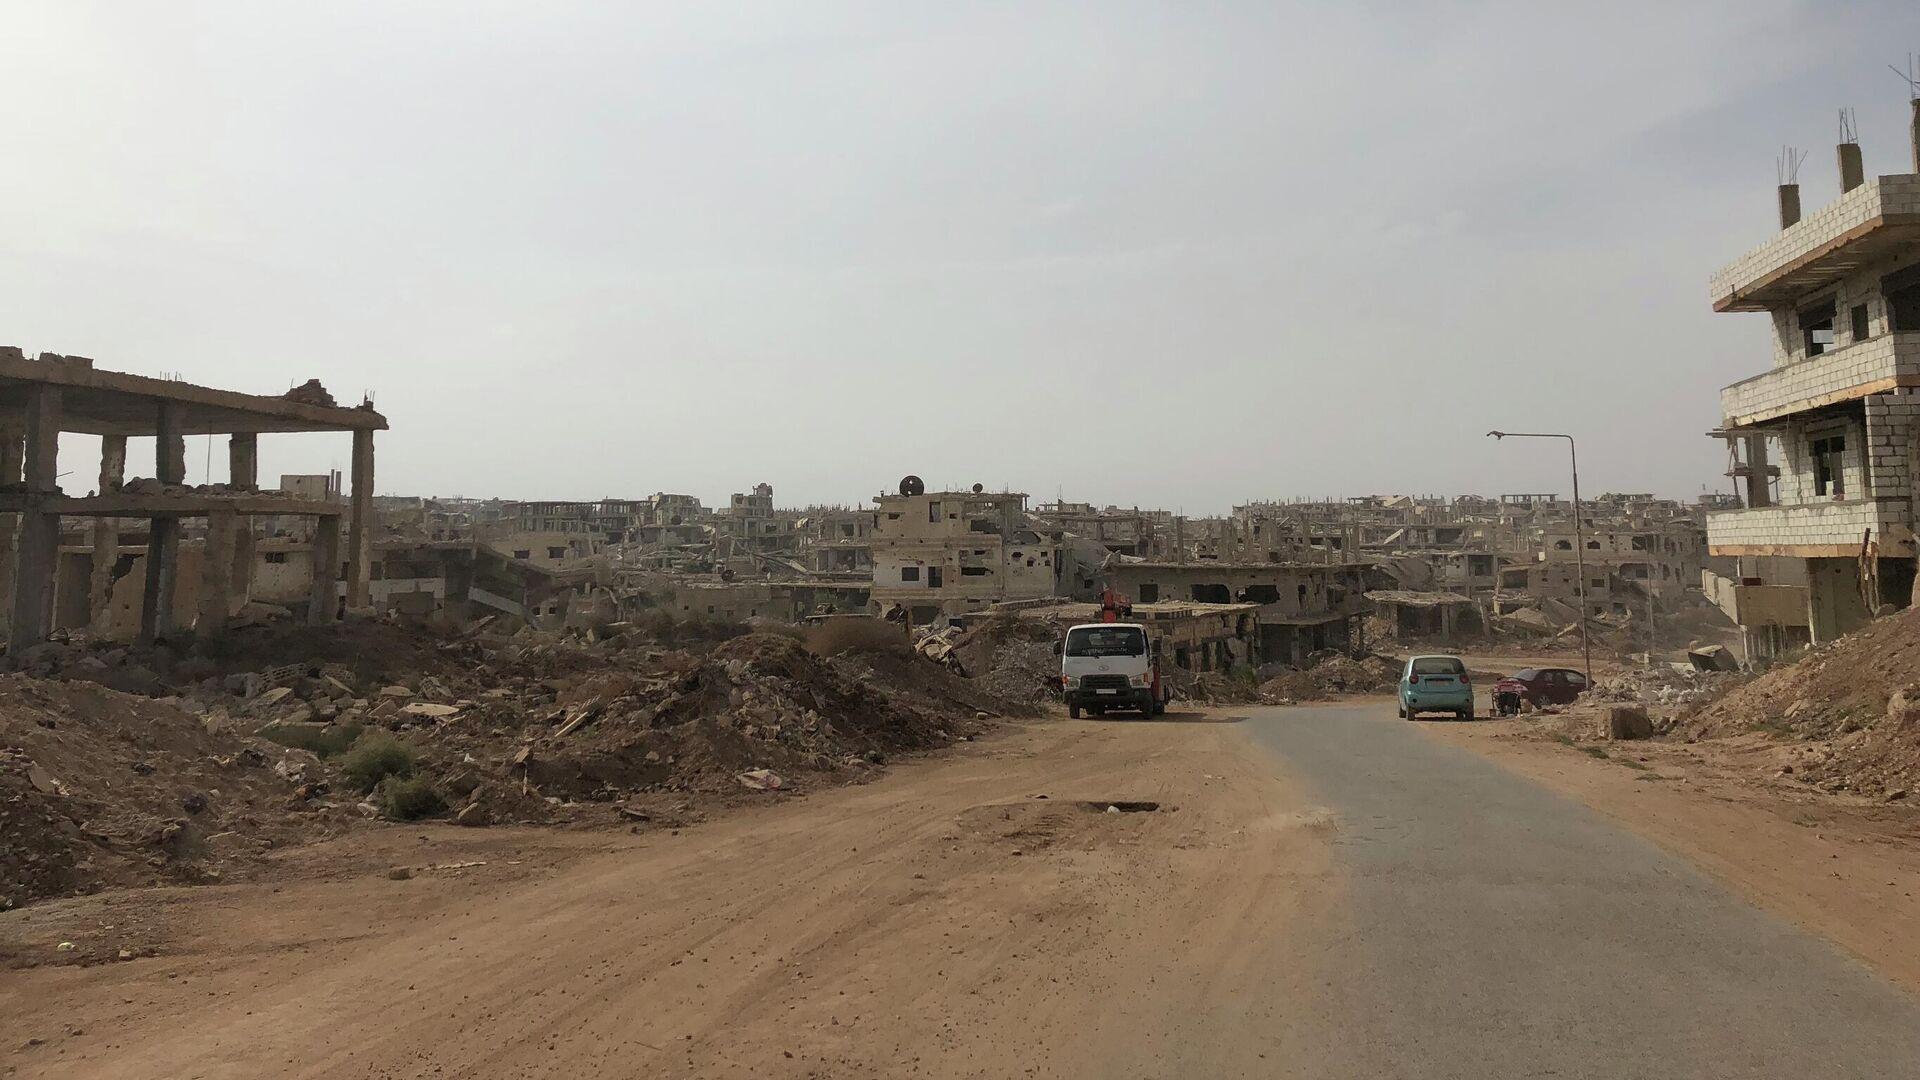 Part of the Daraa al-Balad city in Syria - Sputnik International, 1920, 08.09.2021